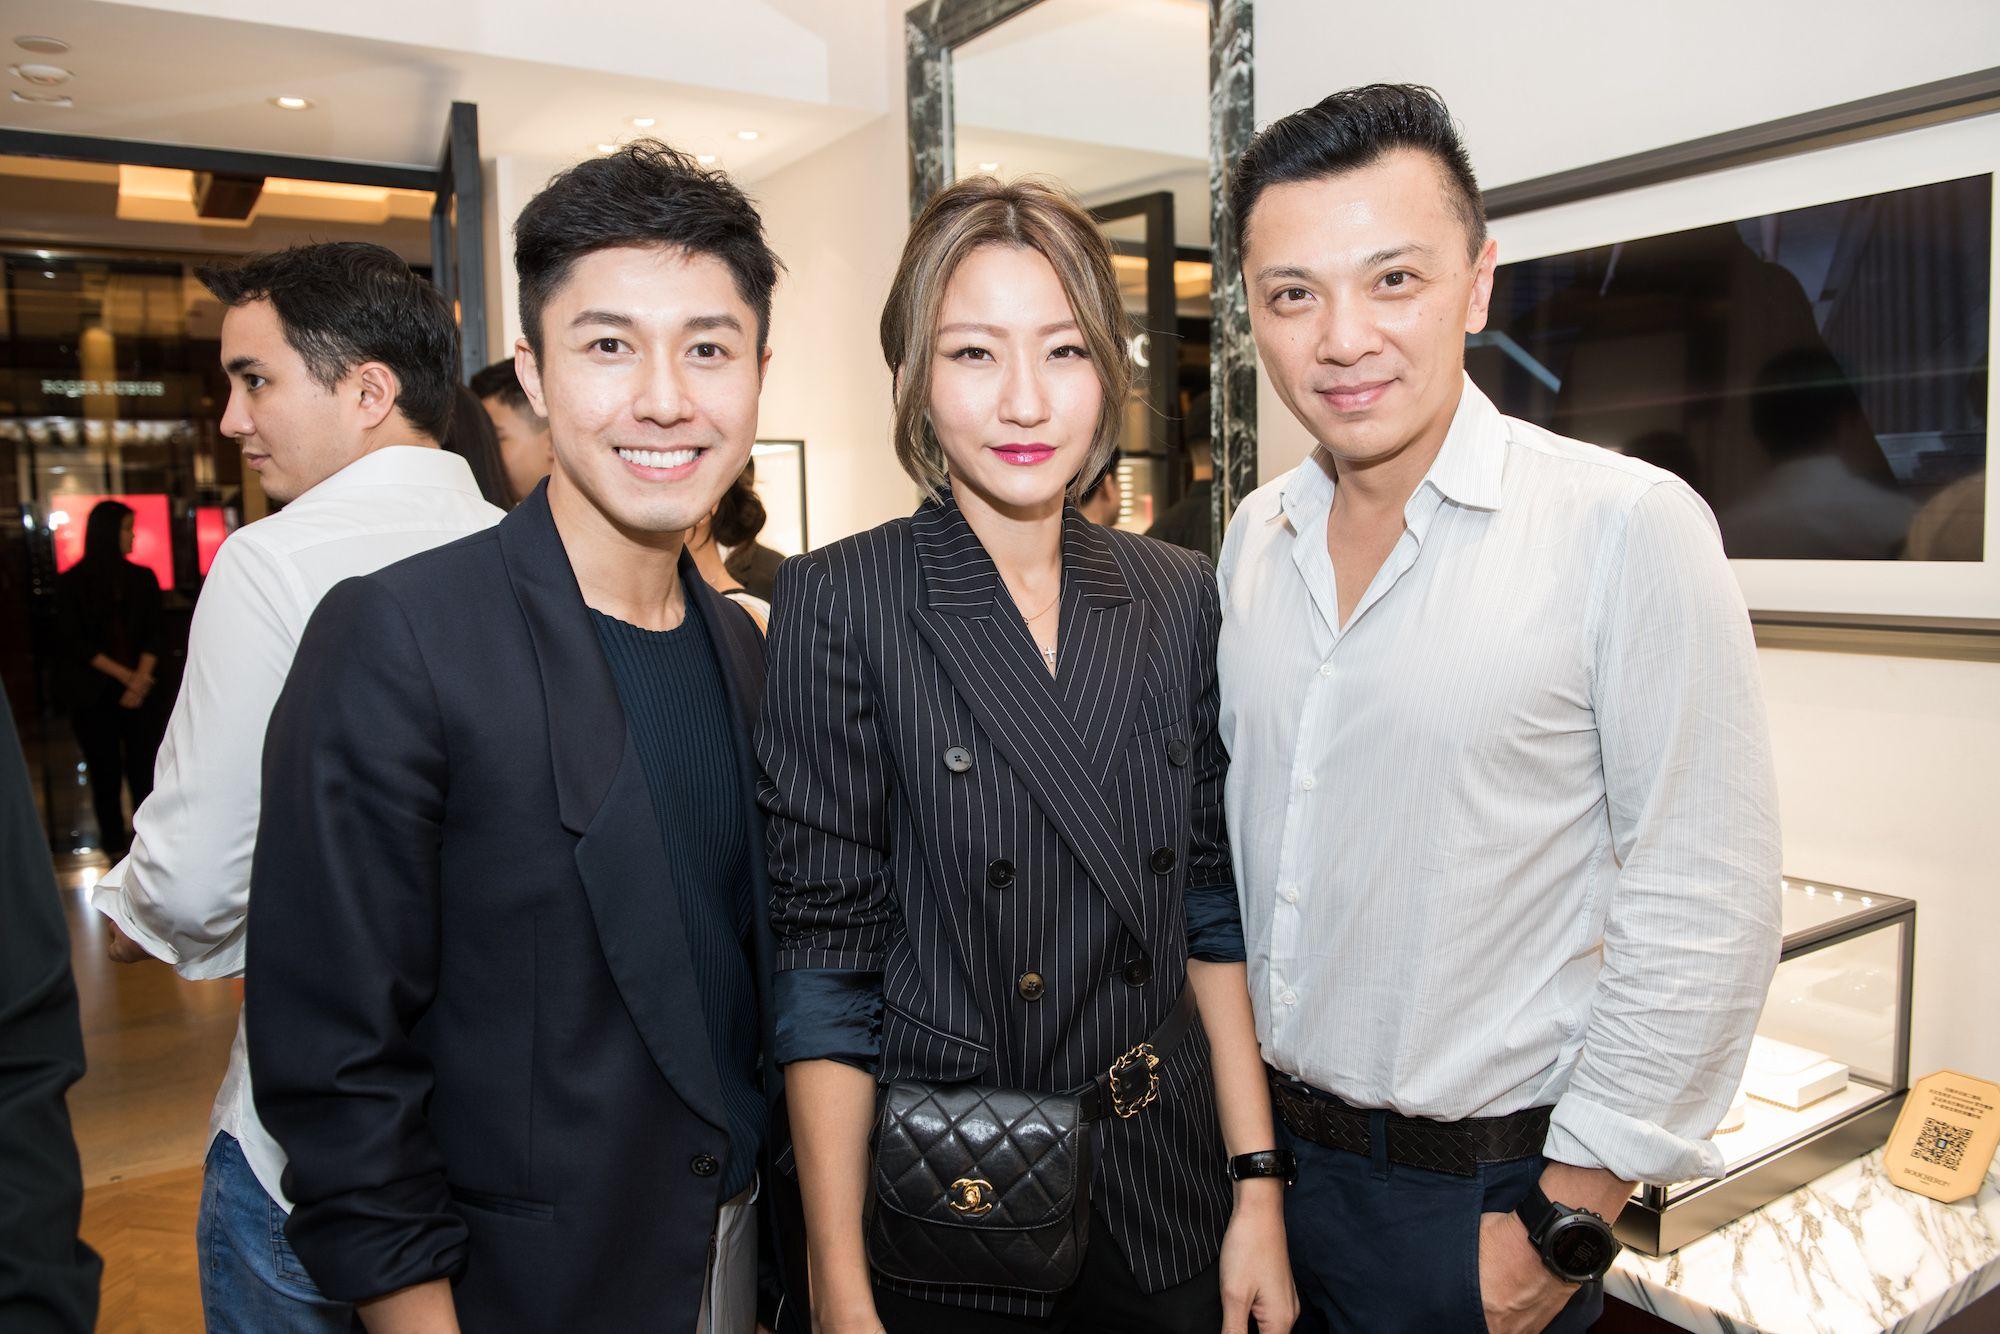 Edwin Pun, Esther Sham, Sunny Tan